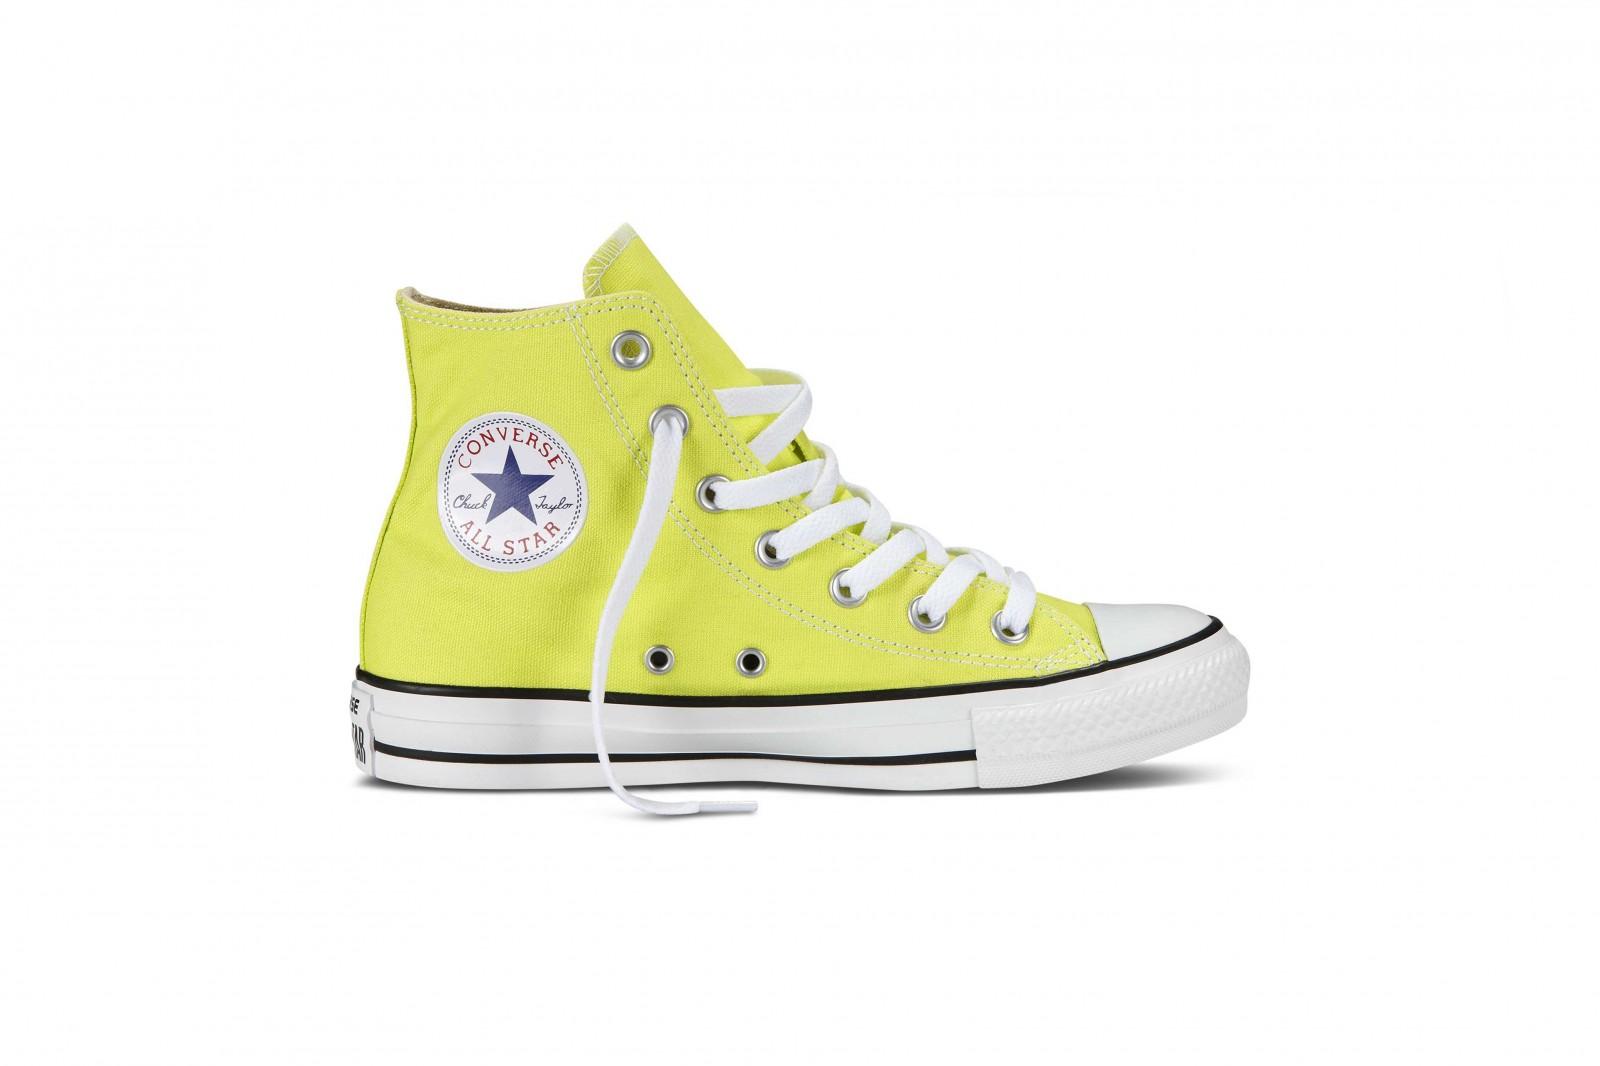 118c35ee747 Pánské boty Converse Chuck Taylor All Star žluté